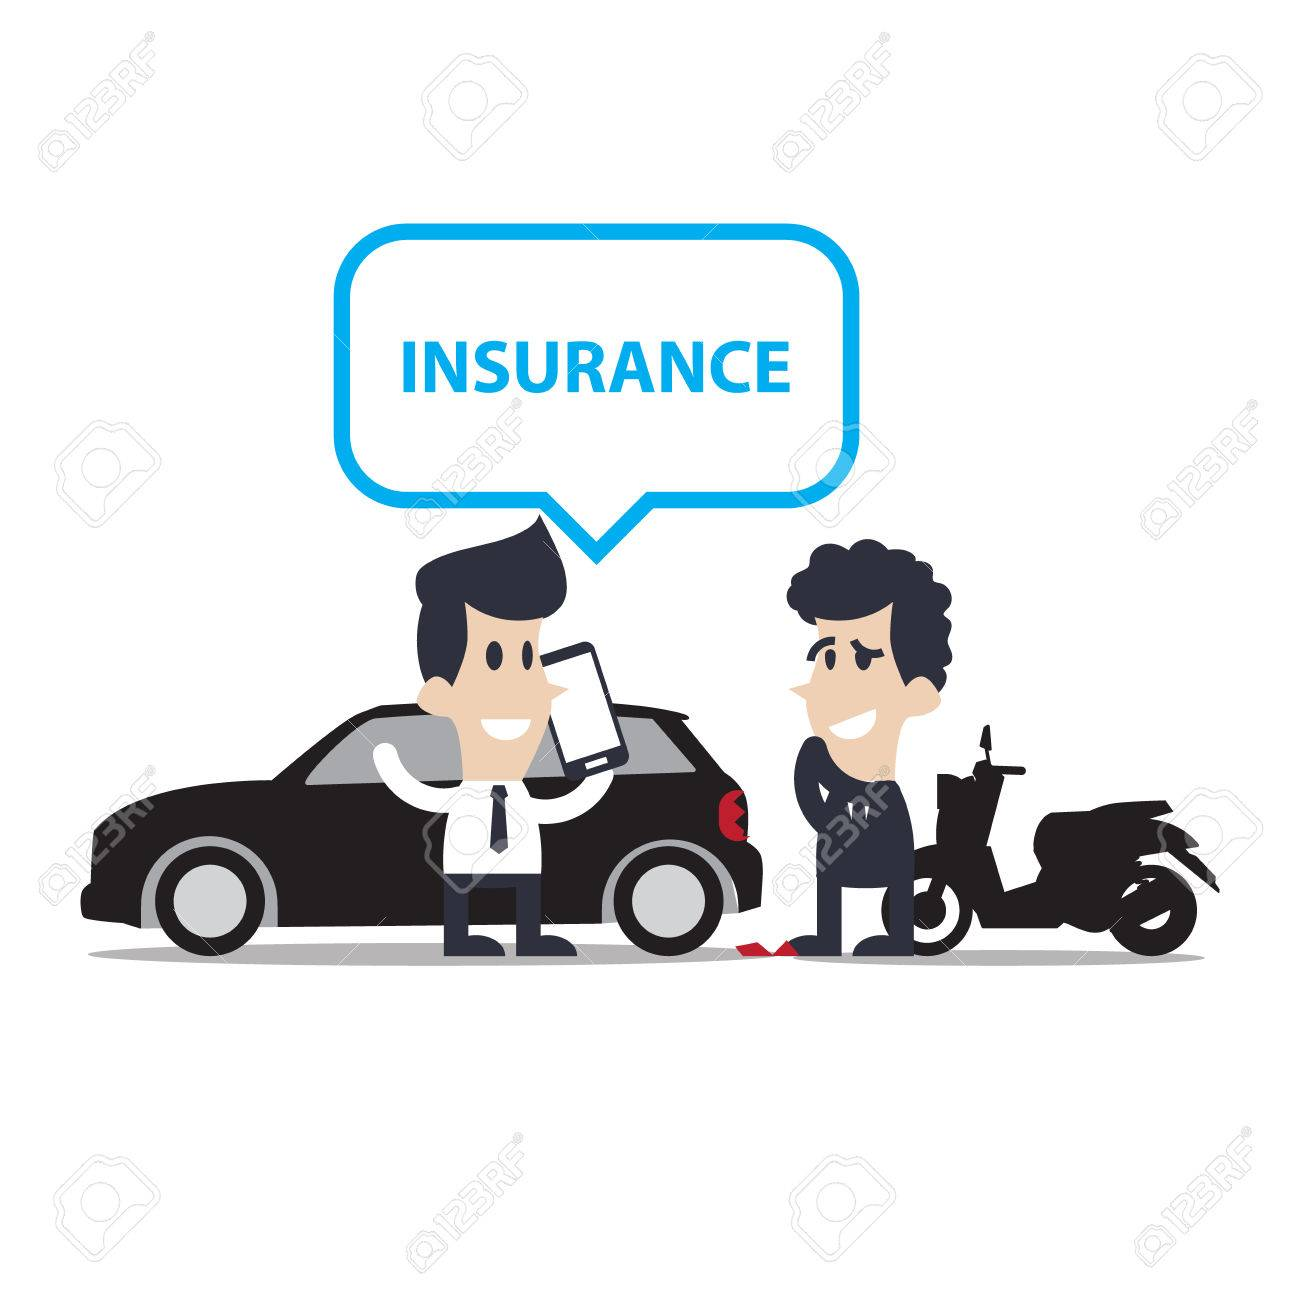 Autounfall Und Unfälle Motorrad Cartoon, Charakter Lizenzfrei ...